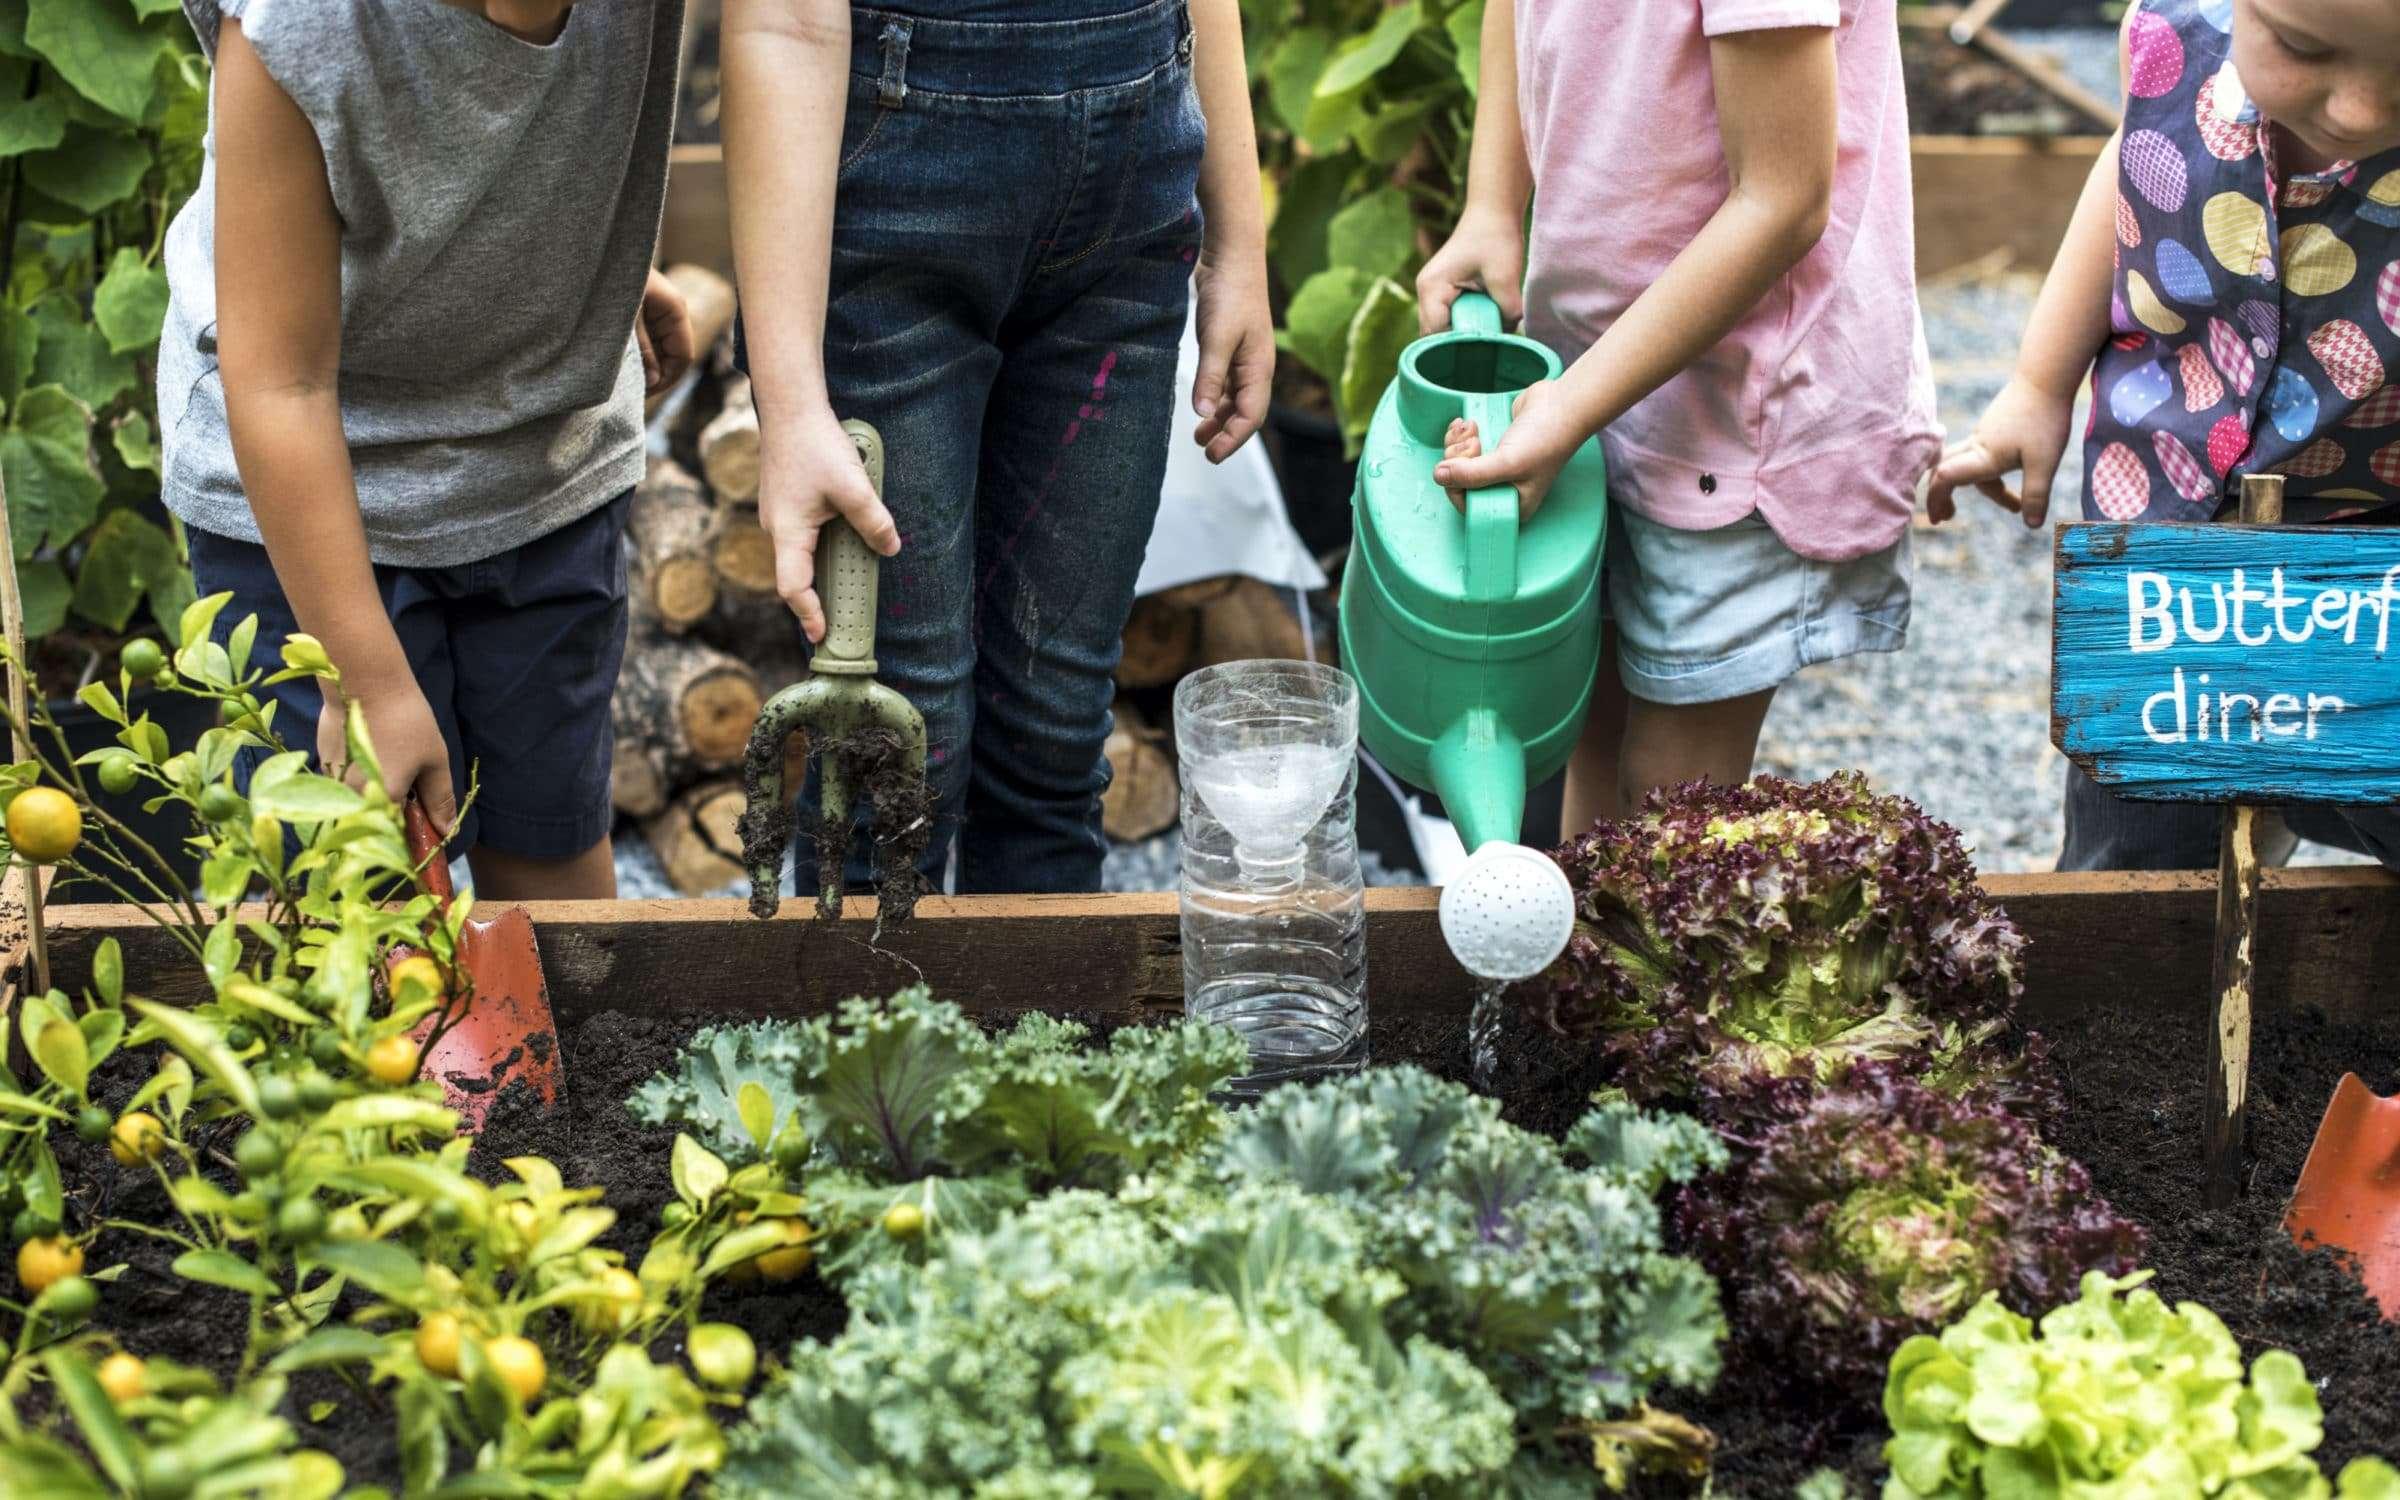 A gardening volunteer group